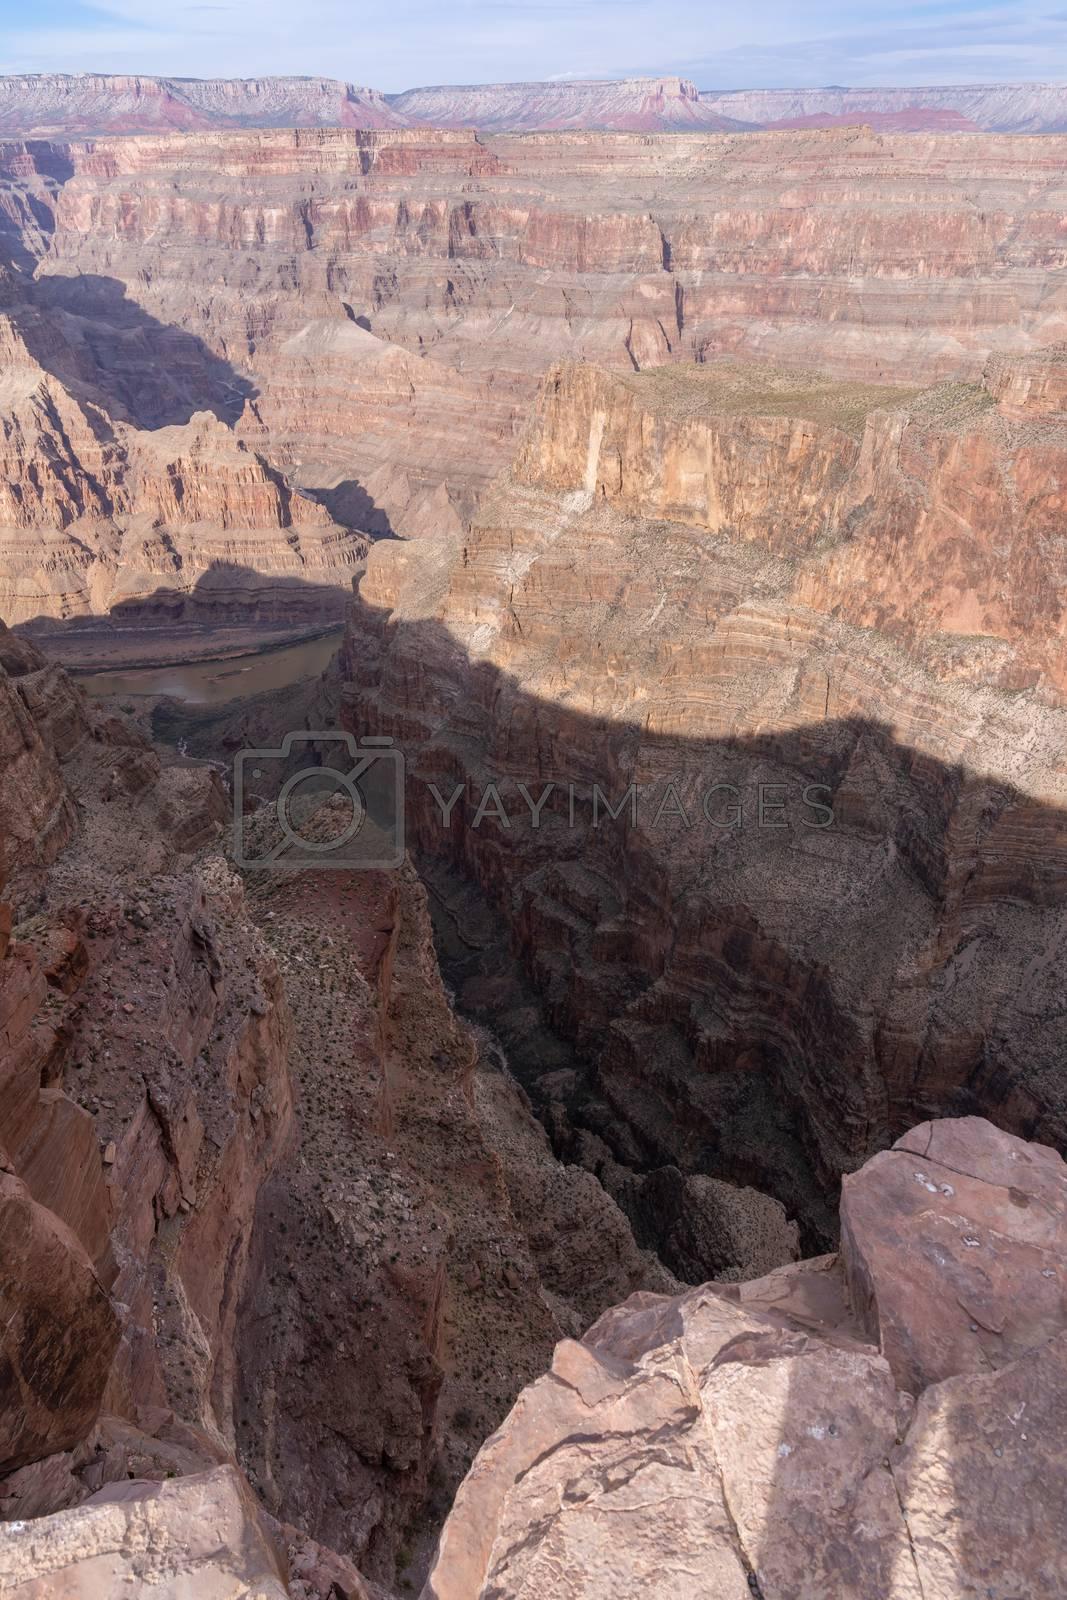 West rim of Grand Canyon in Arizona USA